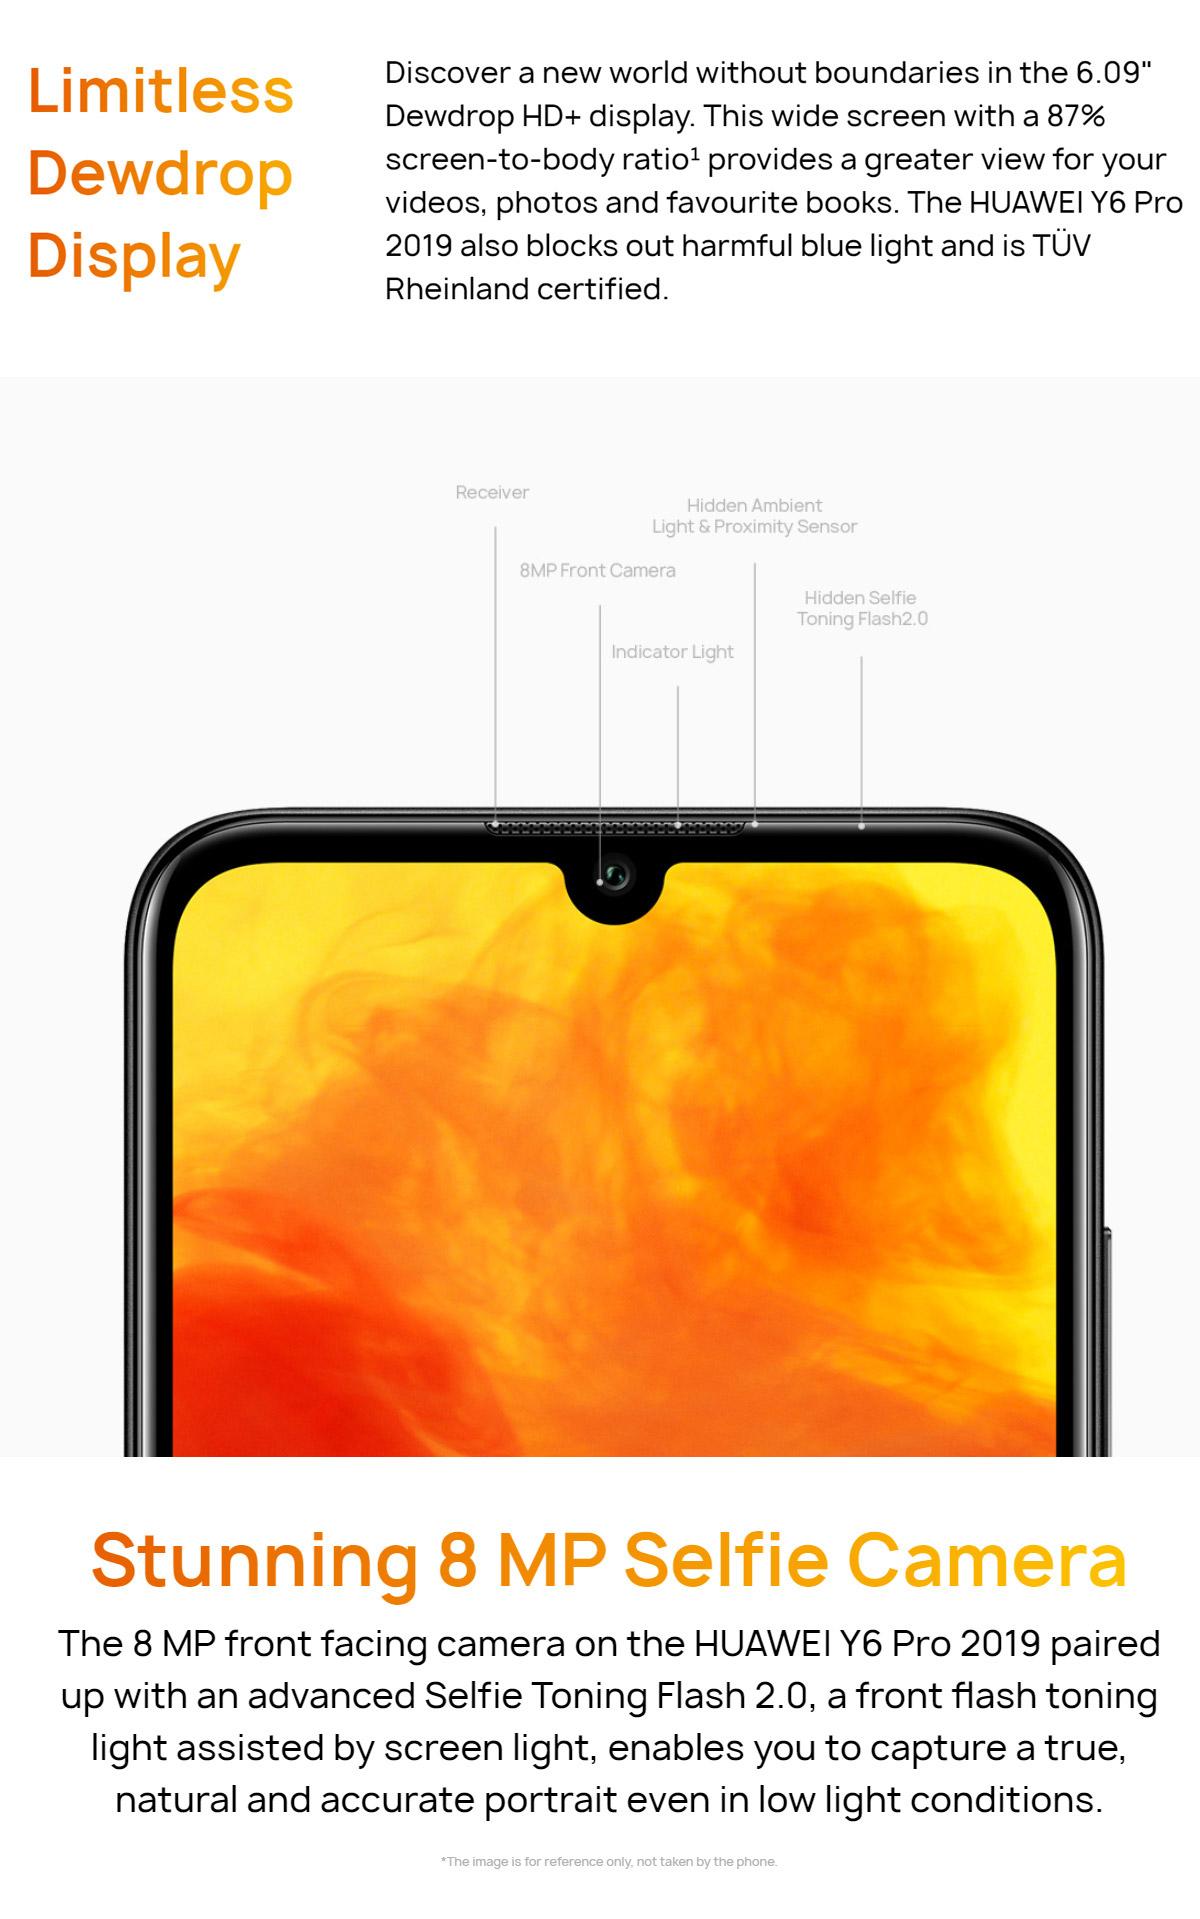 Buy Huawei Y6 Pro (2019) (3GB+32GB) (Brown) | Model HU-Y6-2019-BRW